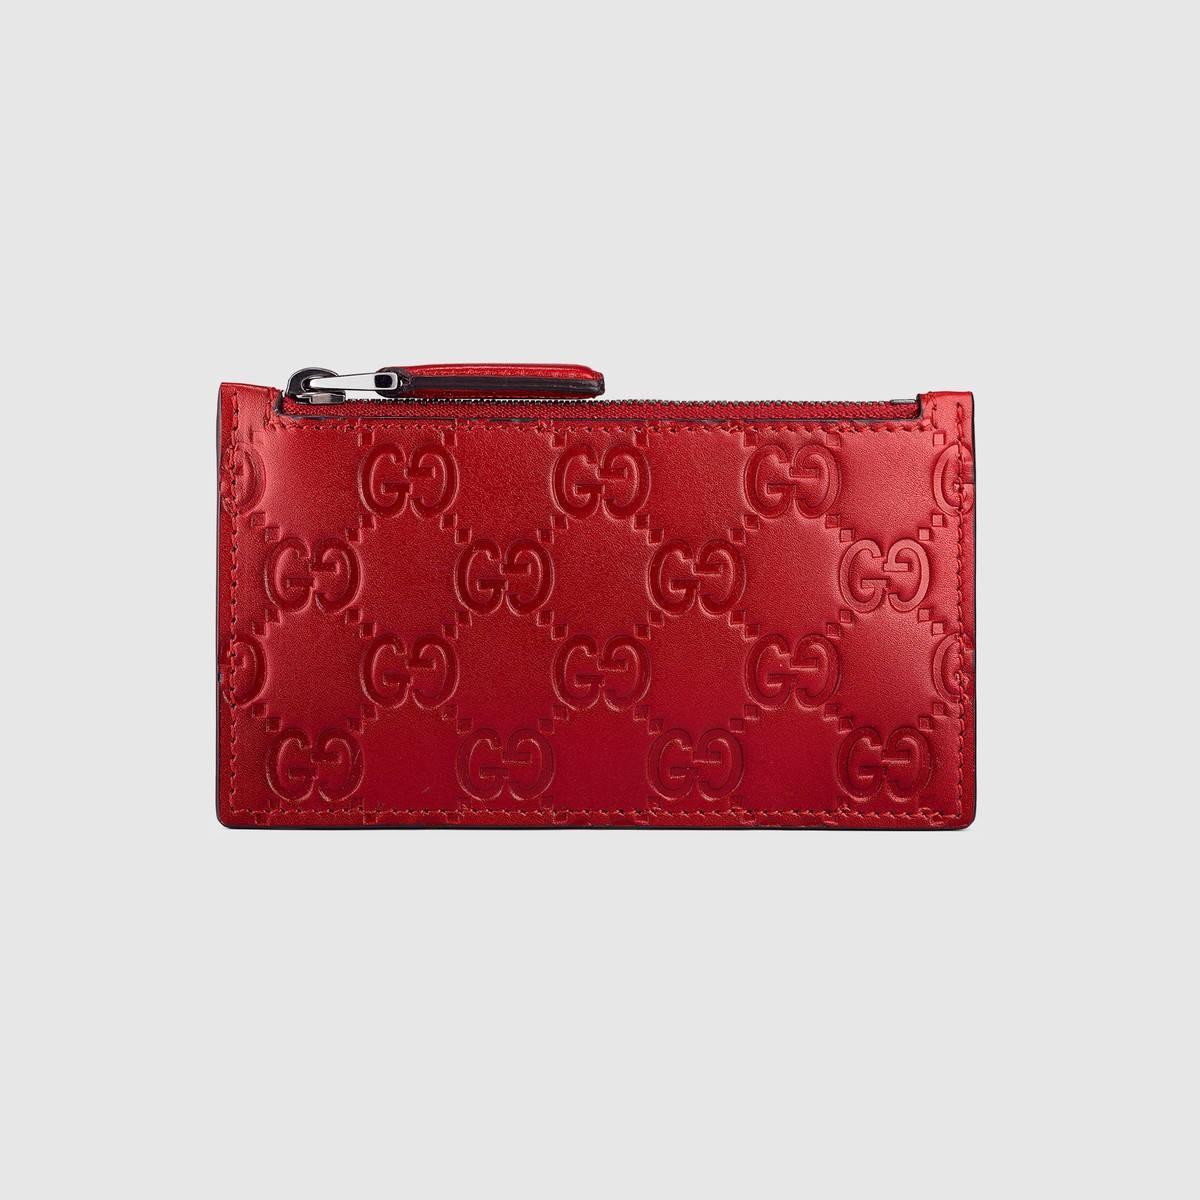 pretty nice edf6a 8b7b3 Gucci Signature Leather Card Case - Red Gucci Signature